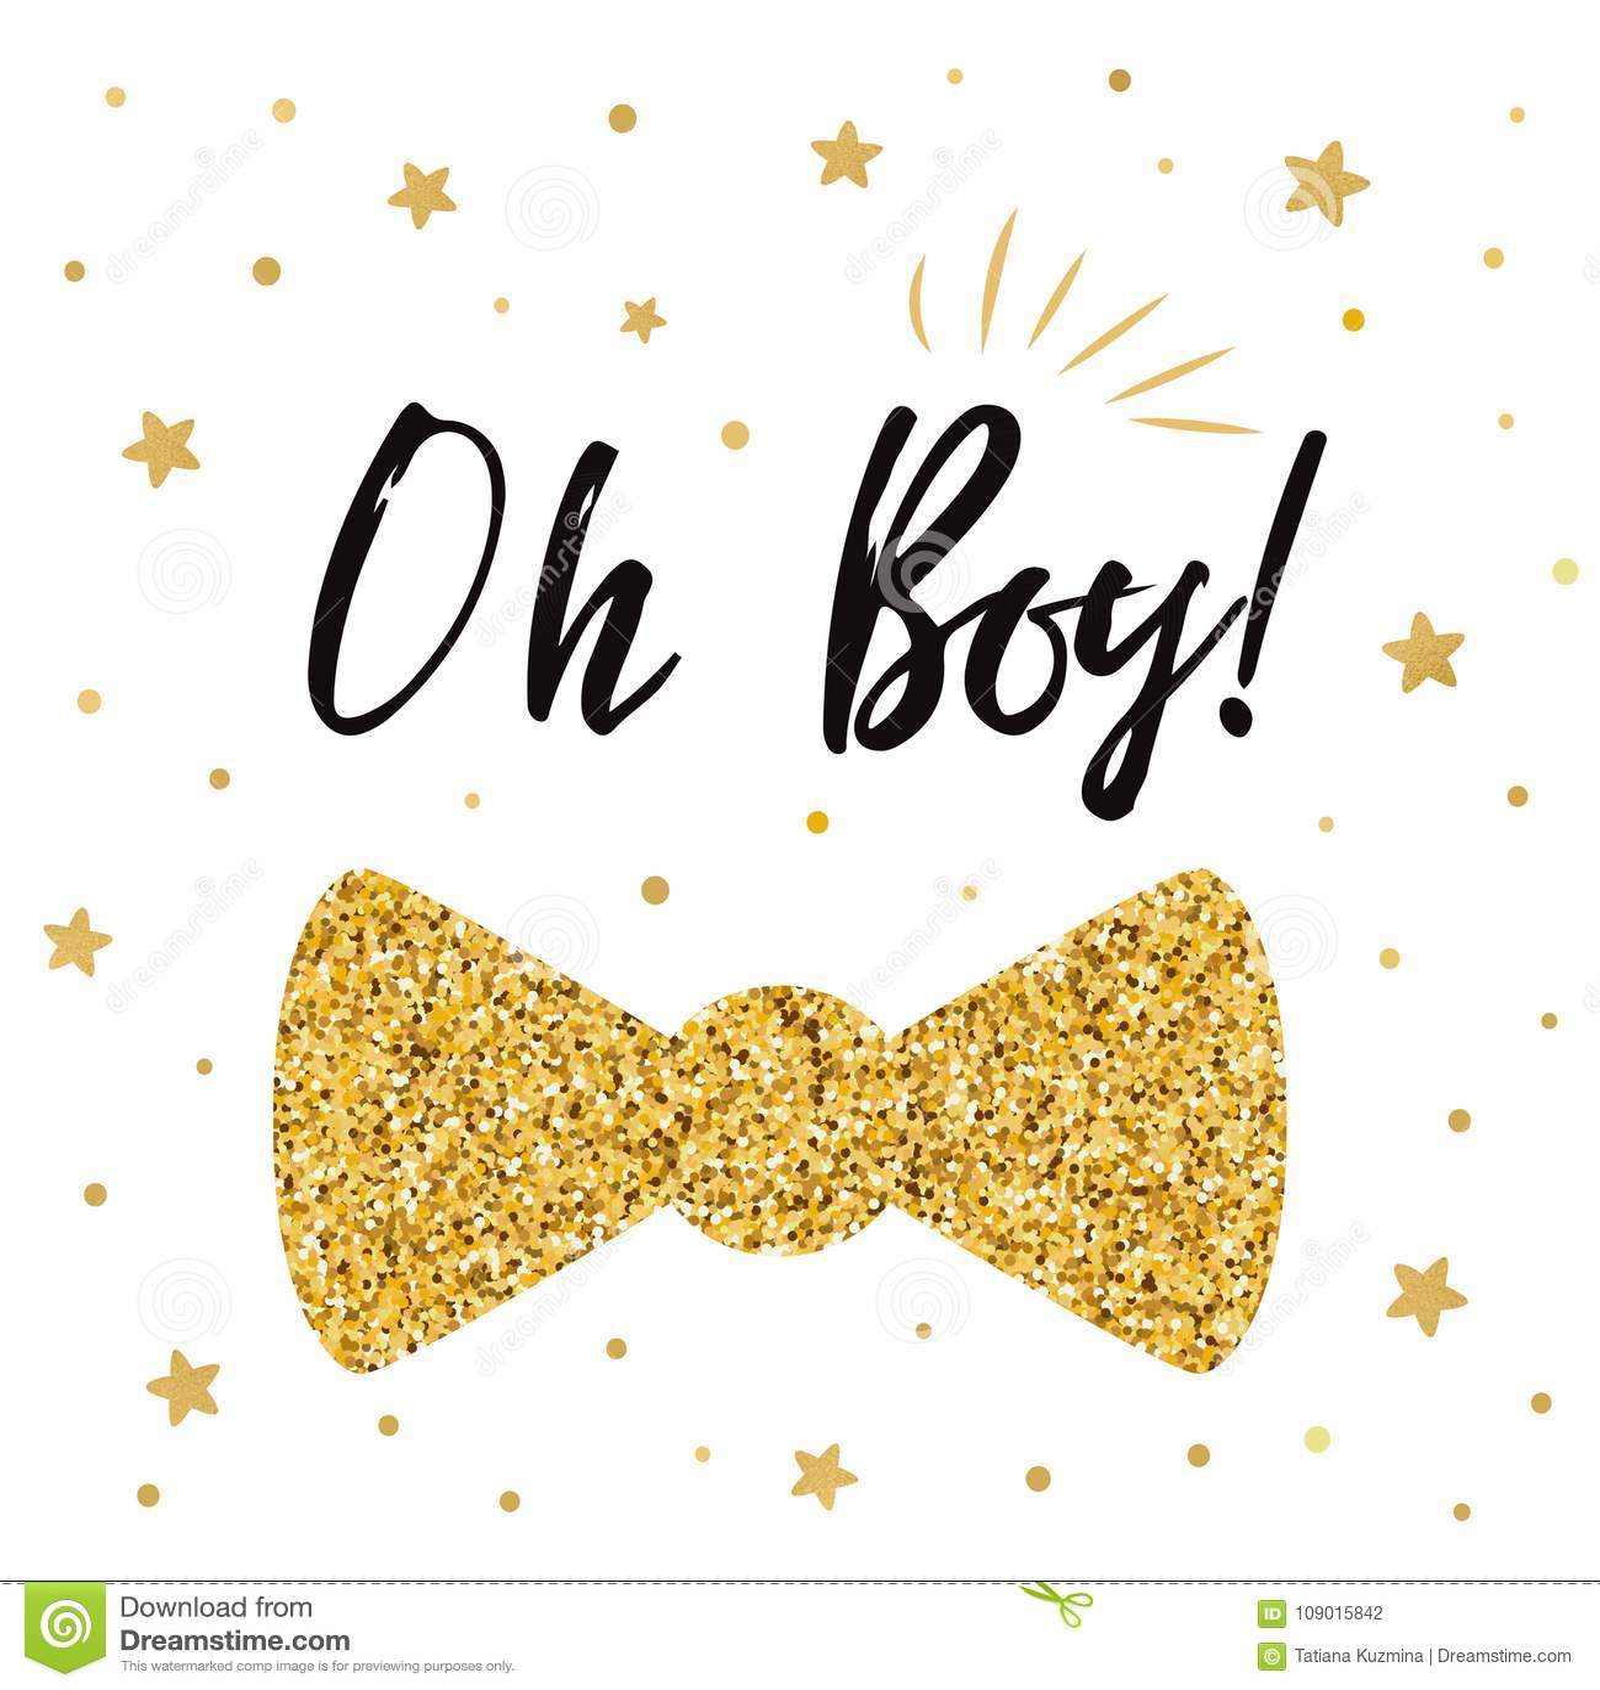 https www dreamstime com oh boy cute baby shower gold stars bow tie butterfly birthday invitation birthdauy vector illustration littlegold black image109015842